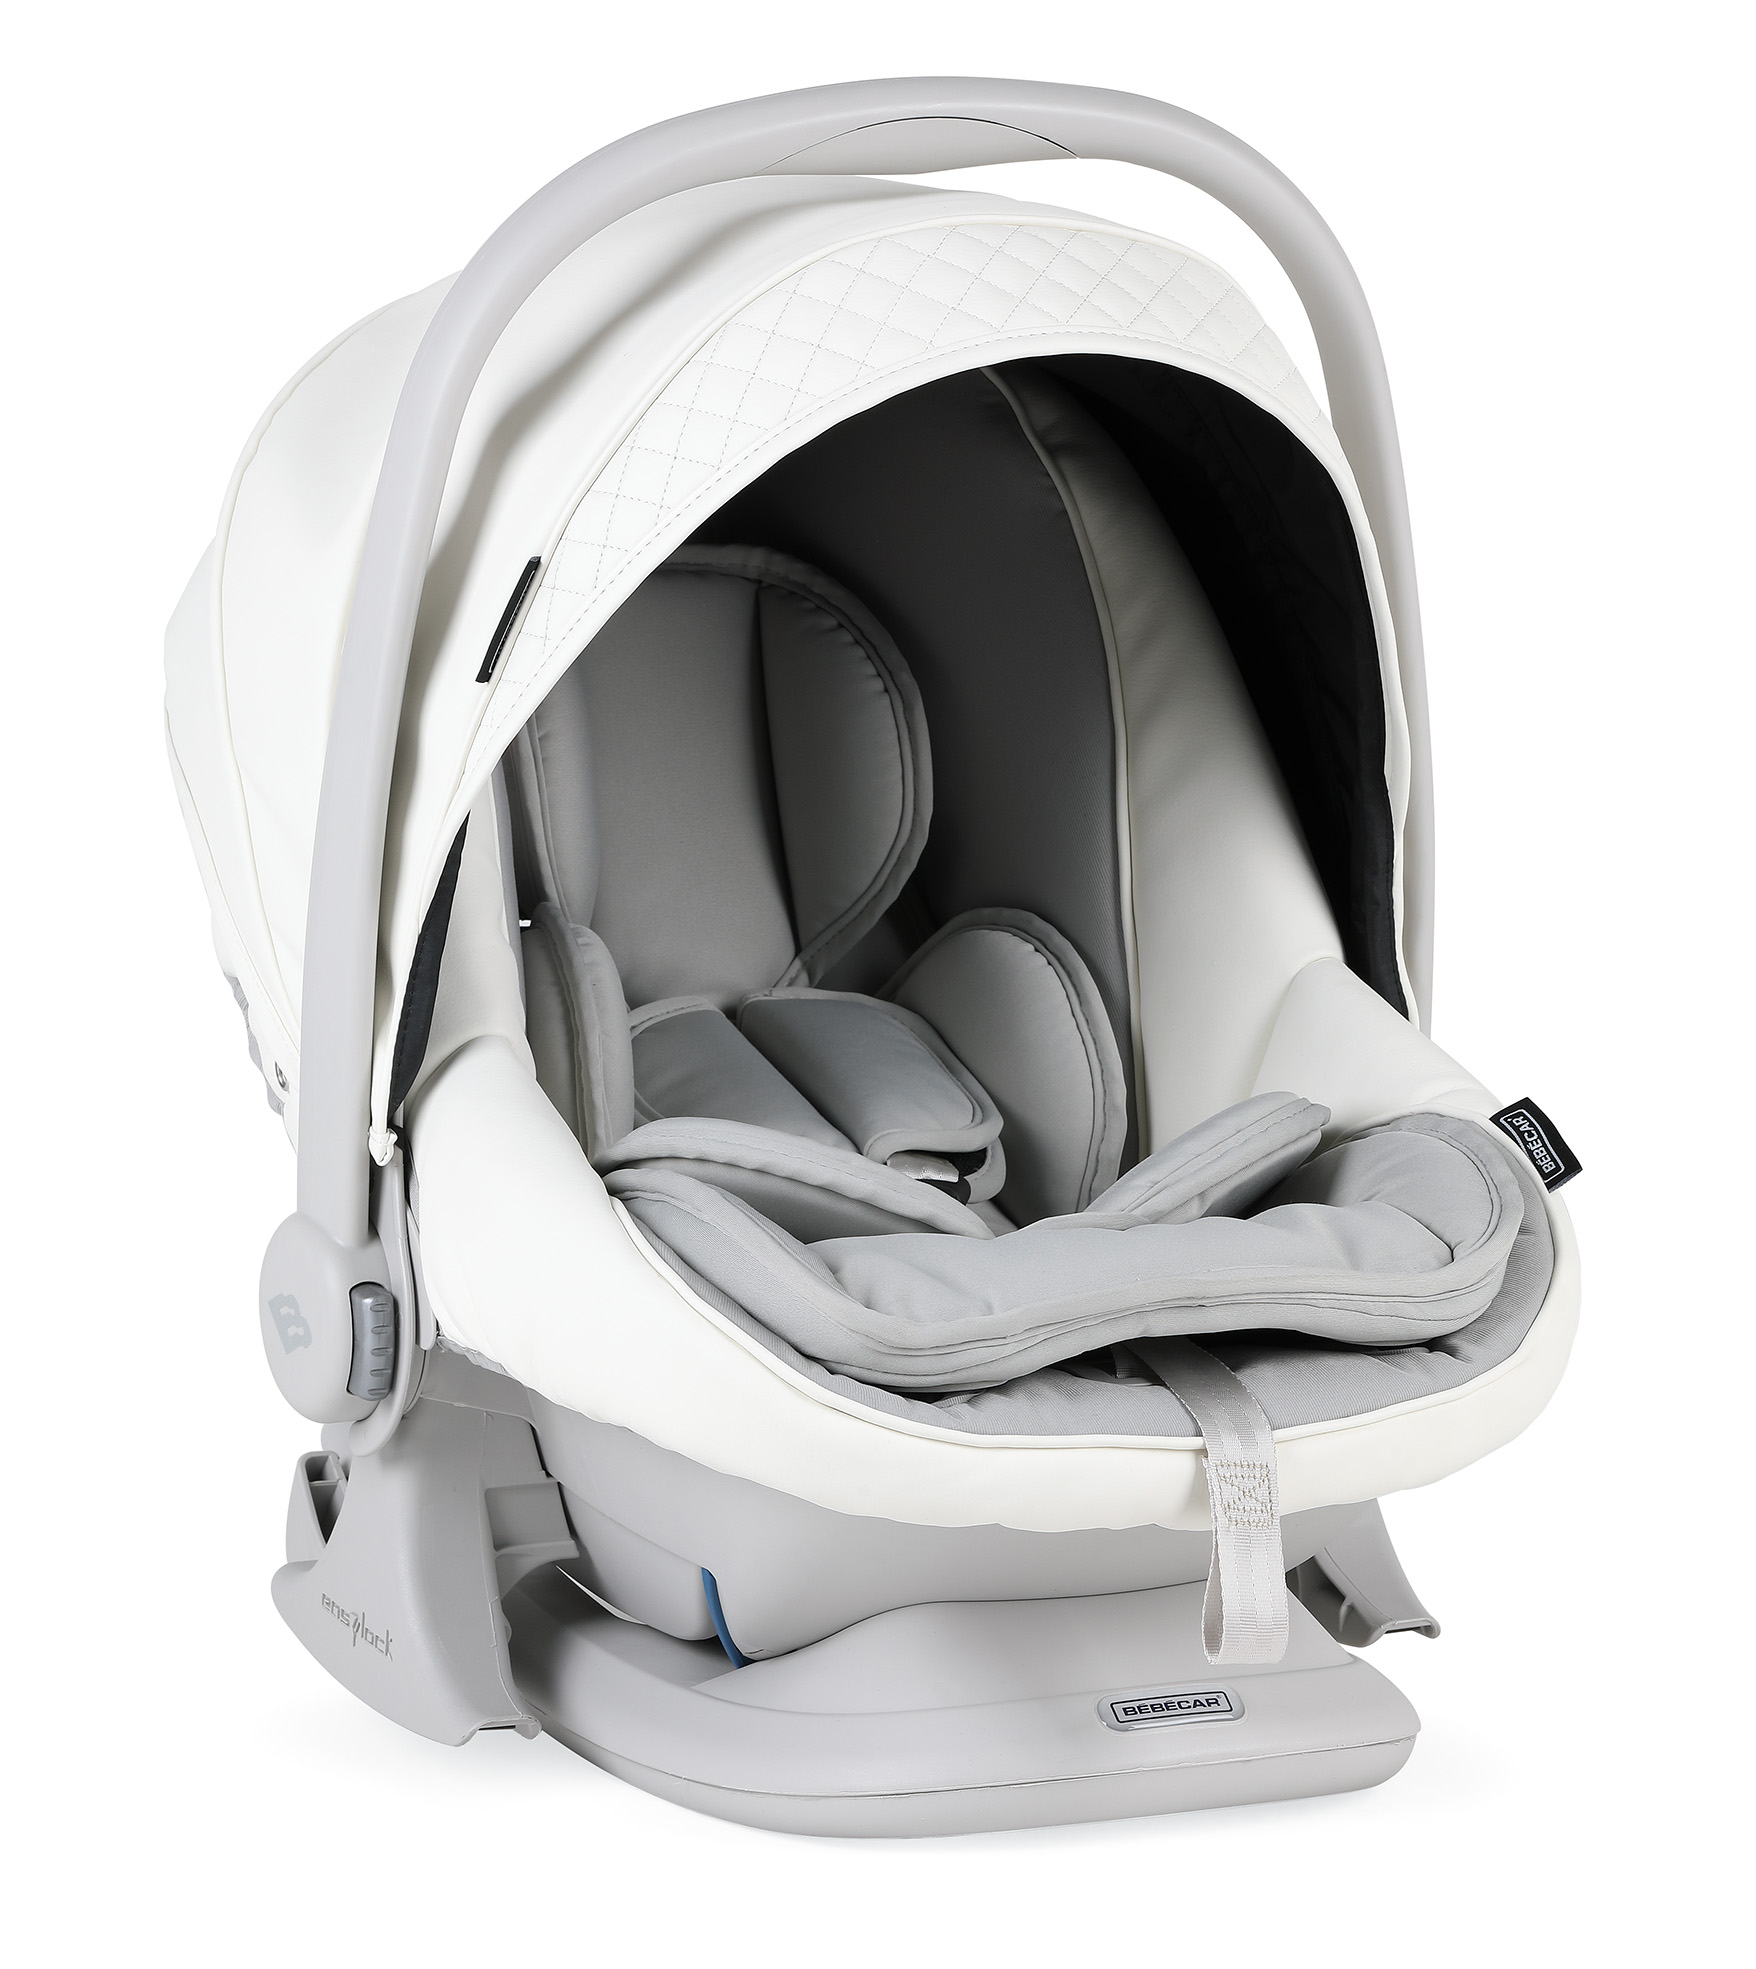 bebecar white delight car seat stylo class